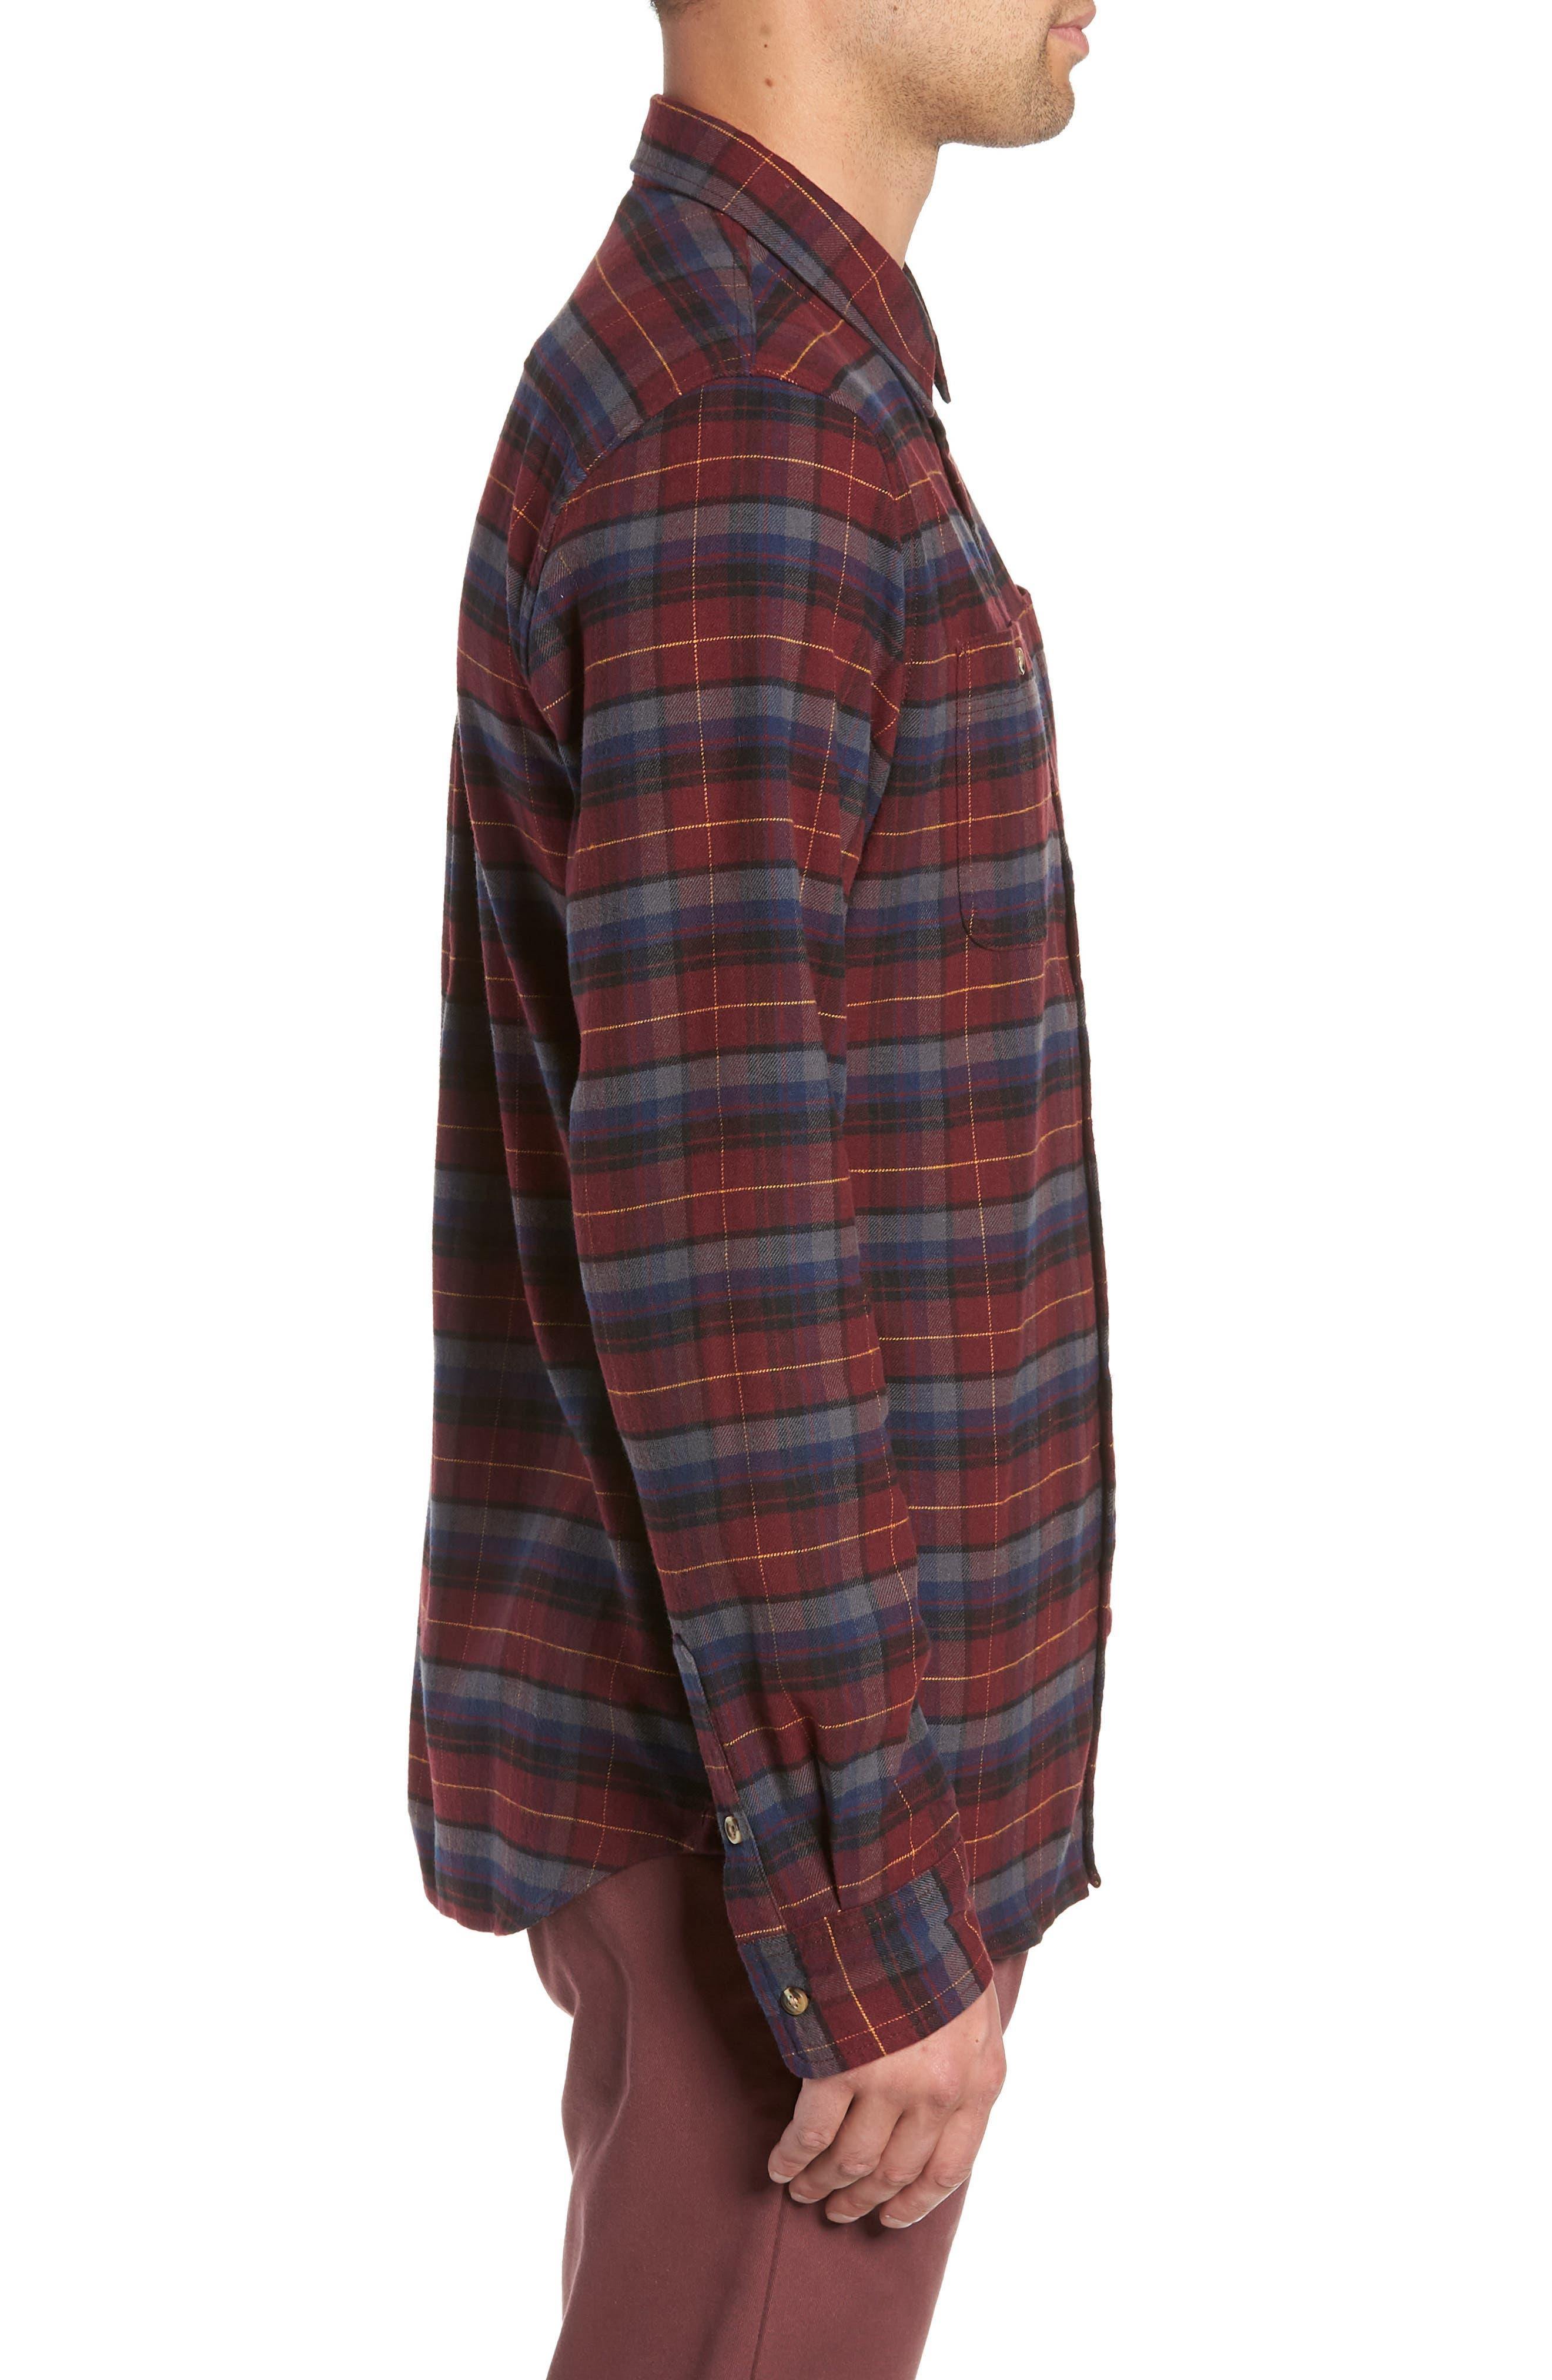 Banfield III Plaid Flannel Shirt,                             Alternate thumbnail 4, color,                             930